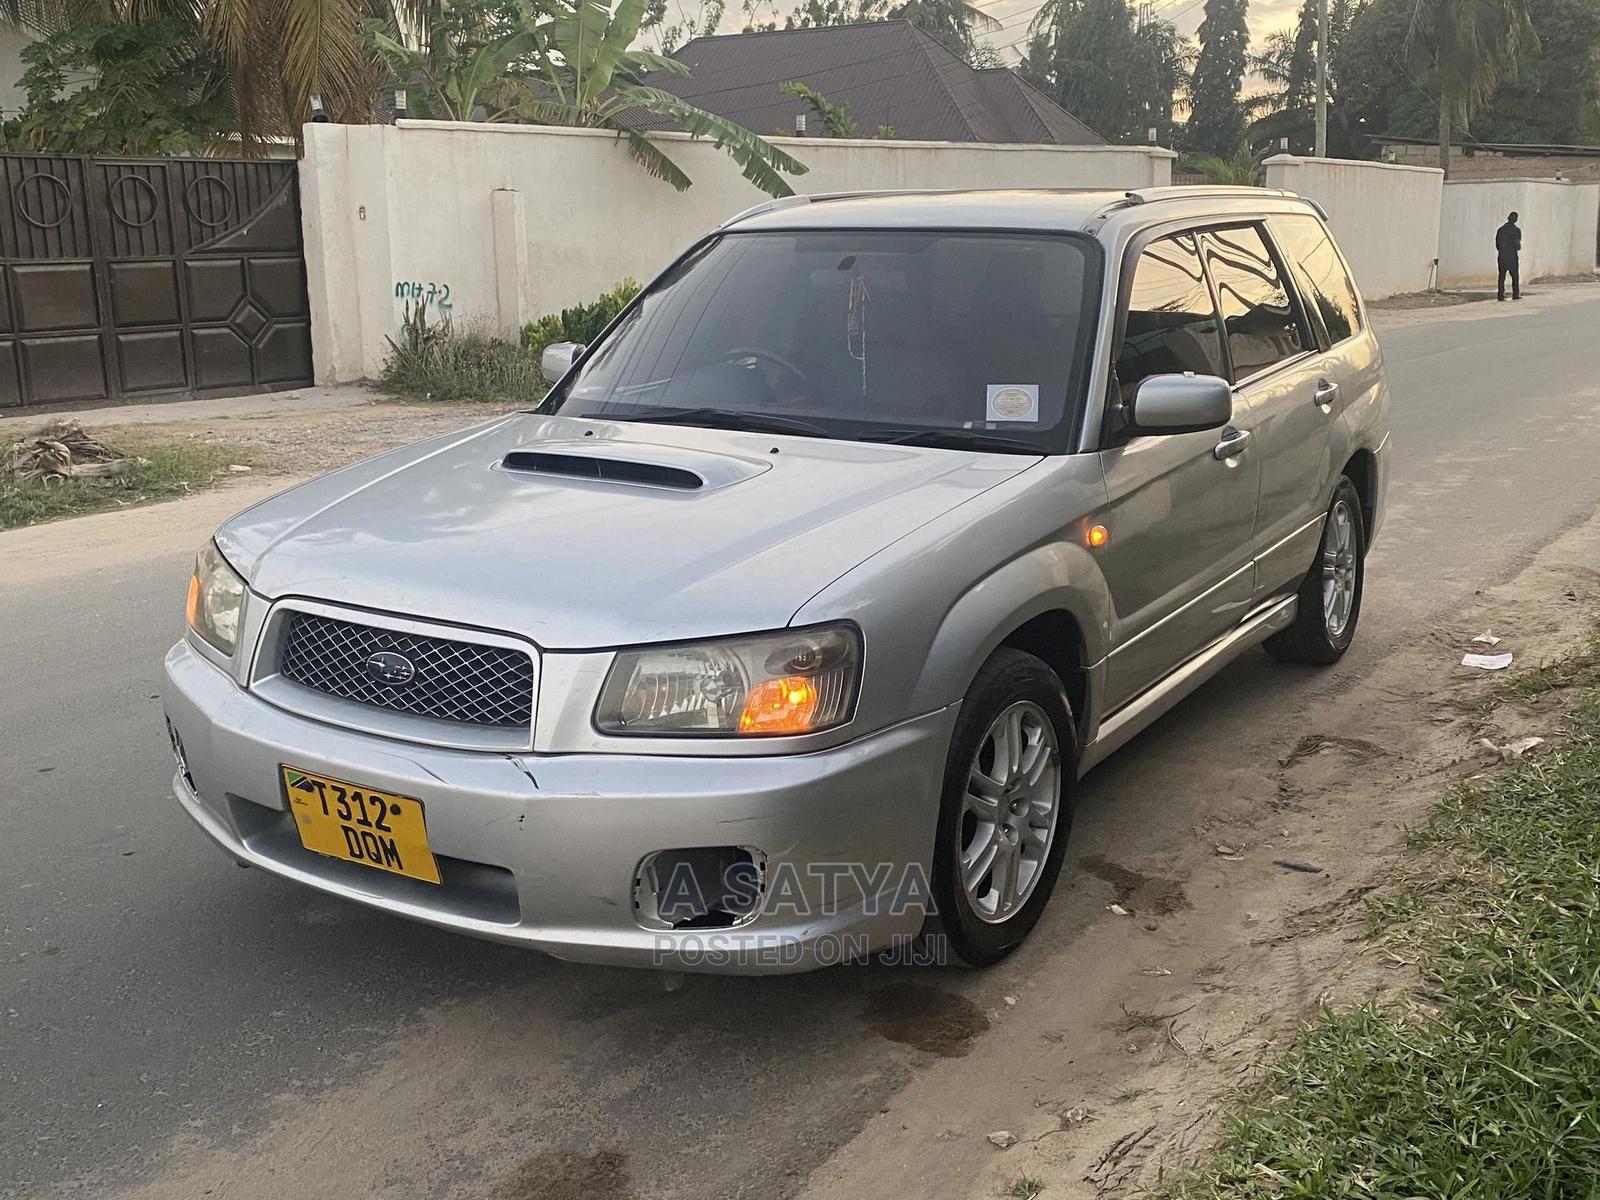 Archive: Subaru Forester 2001 Automatic Silver